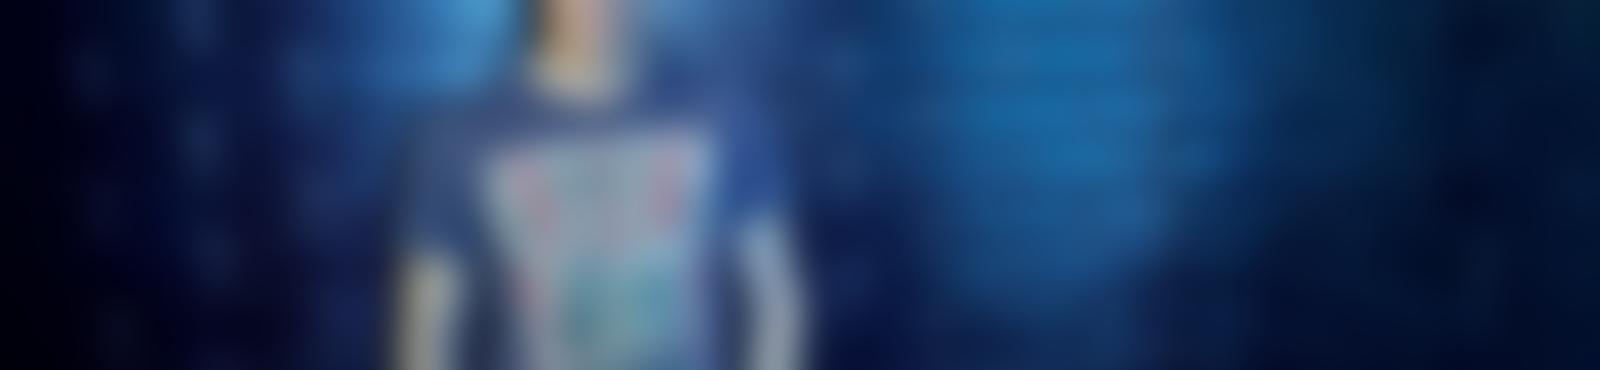 Blurred 19acb383 cb91 4676 b8db e61671dc2c69